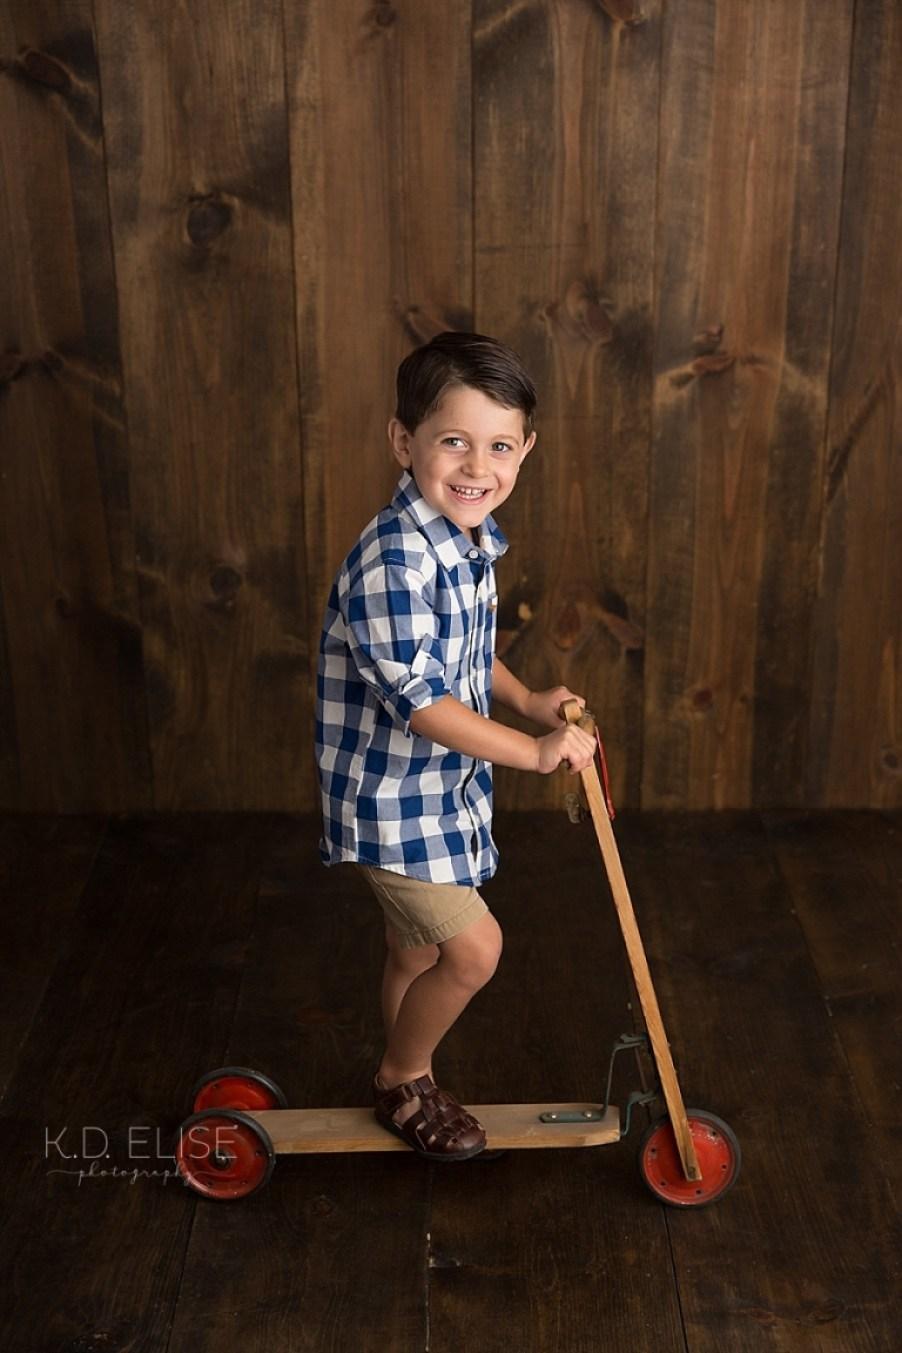 Little boy on a vintage scooter.